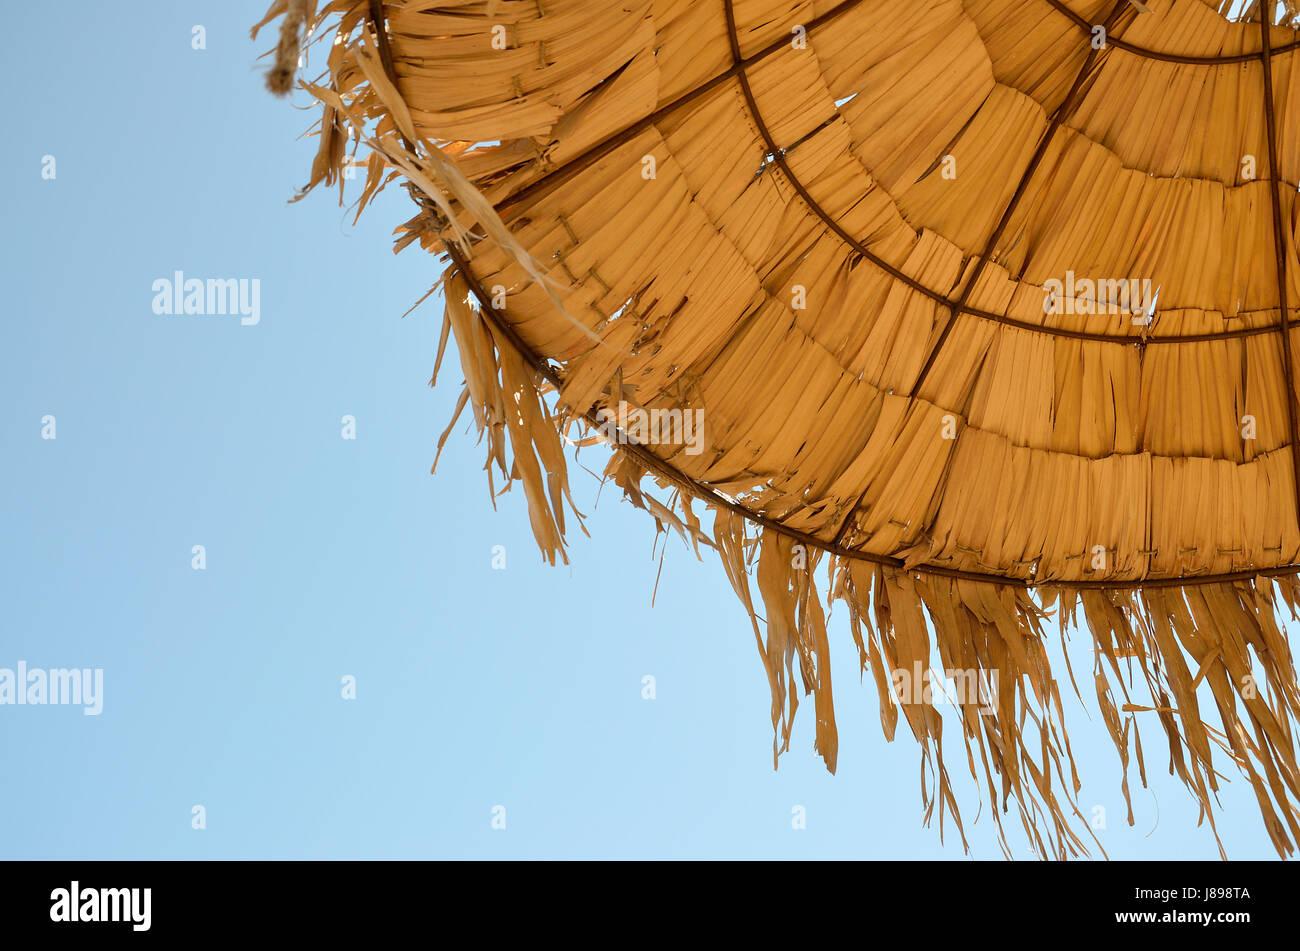 straws of straw umbrella against the blue sky - Stock Image